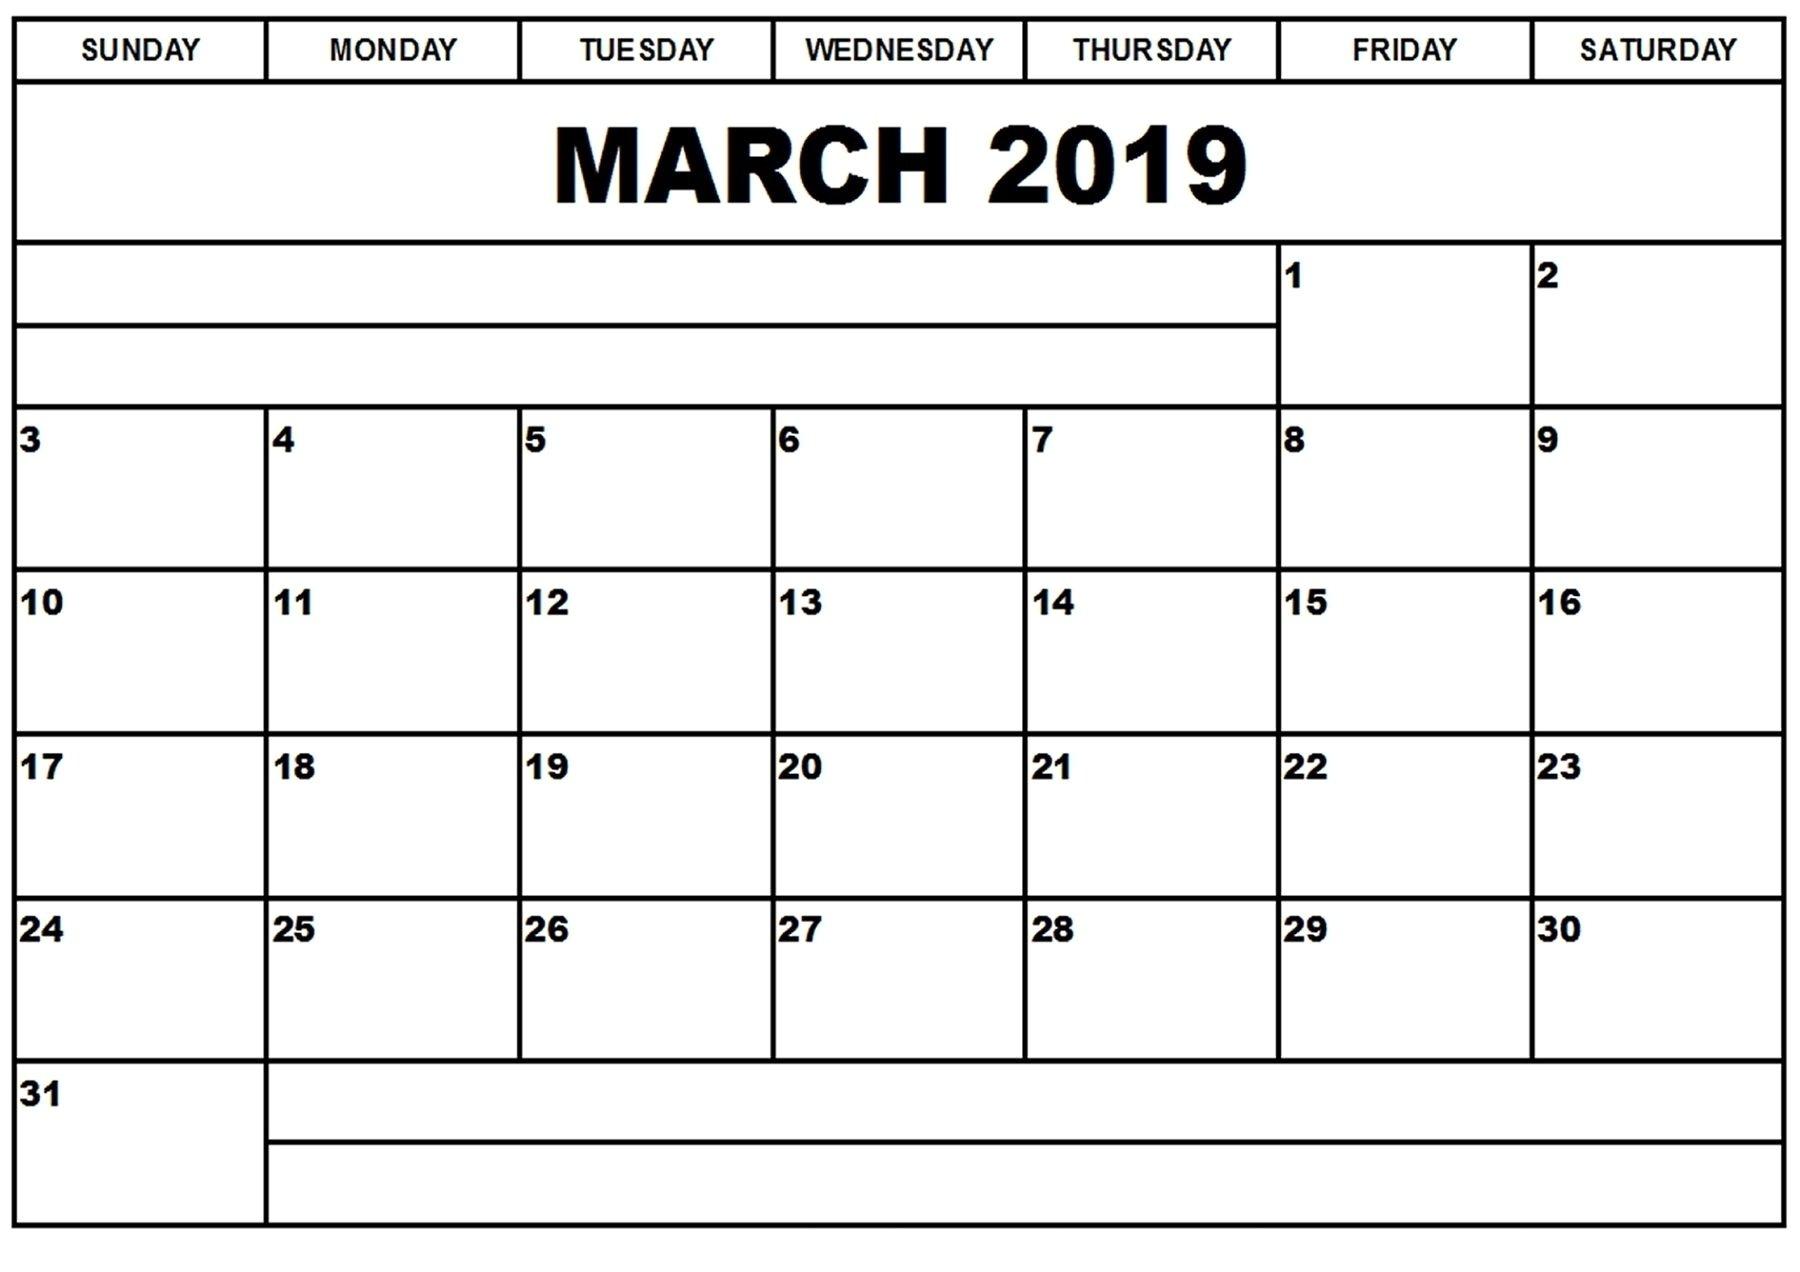 Free Printable Large Grid Calendar   Month Calendar Printable intended for Weekly Planner Grid Free Printable Image